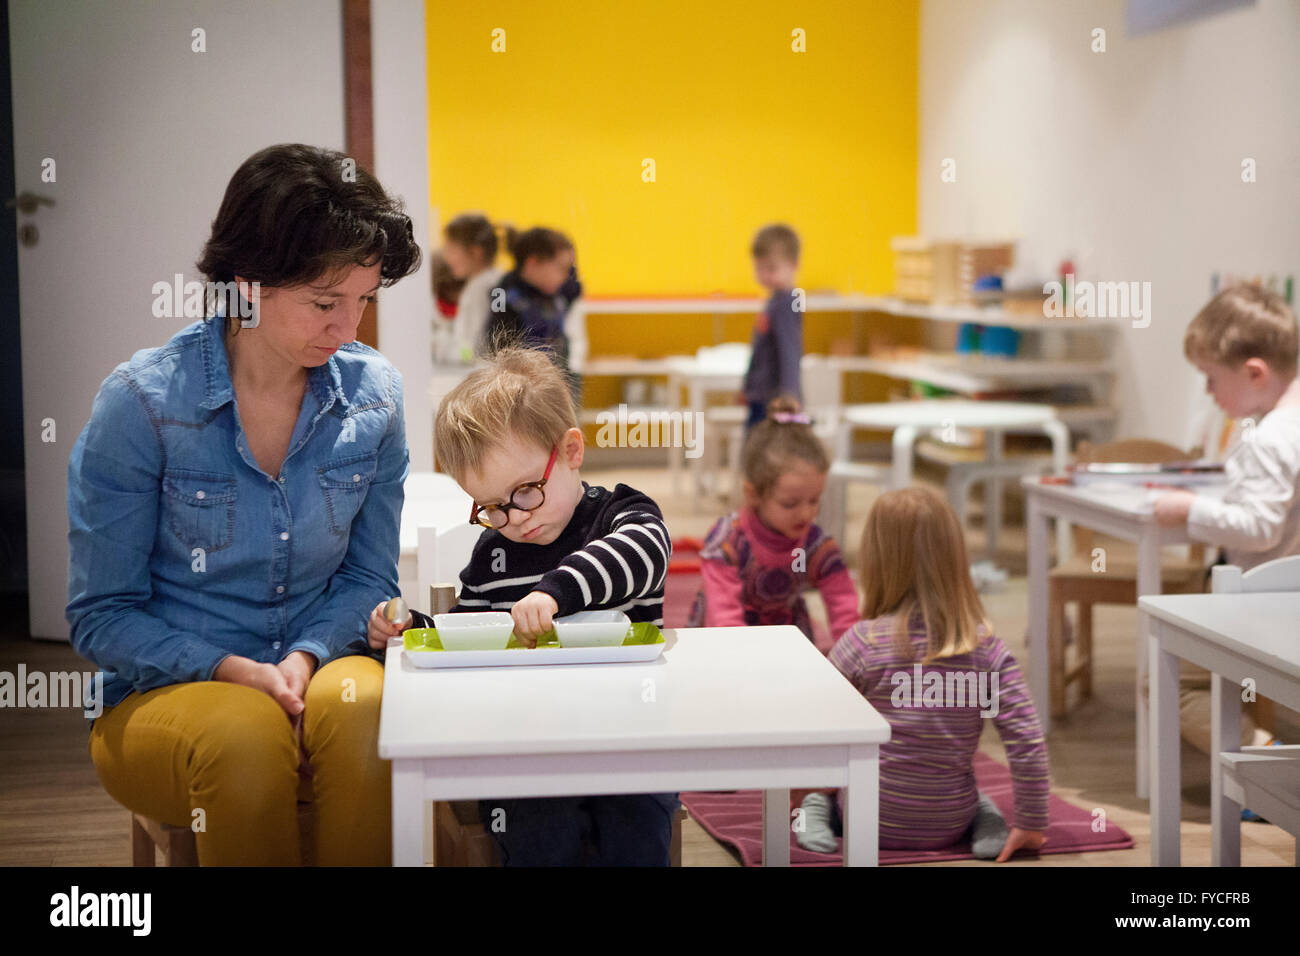 NURSERY SCHOOL - Stock Image